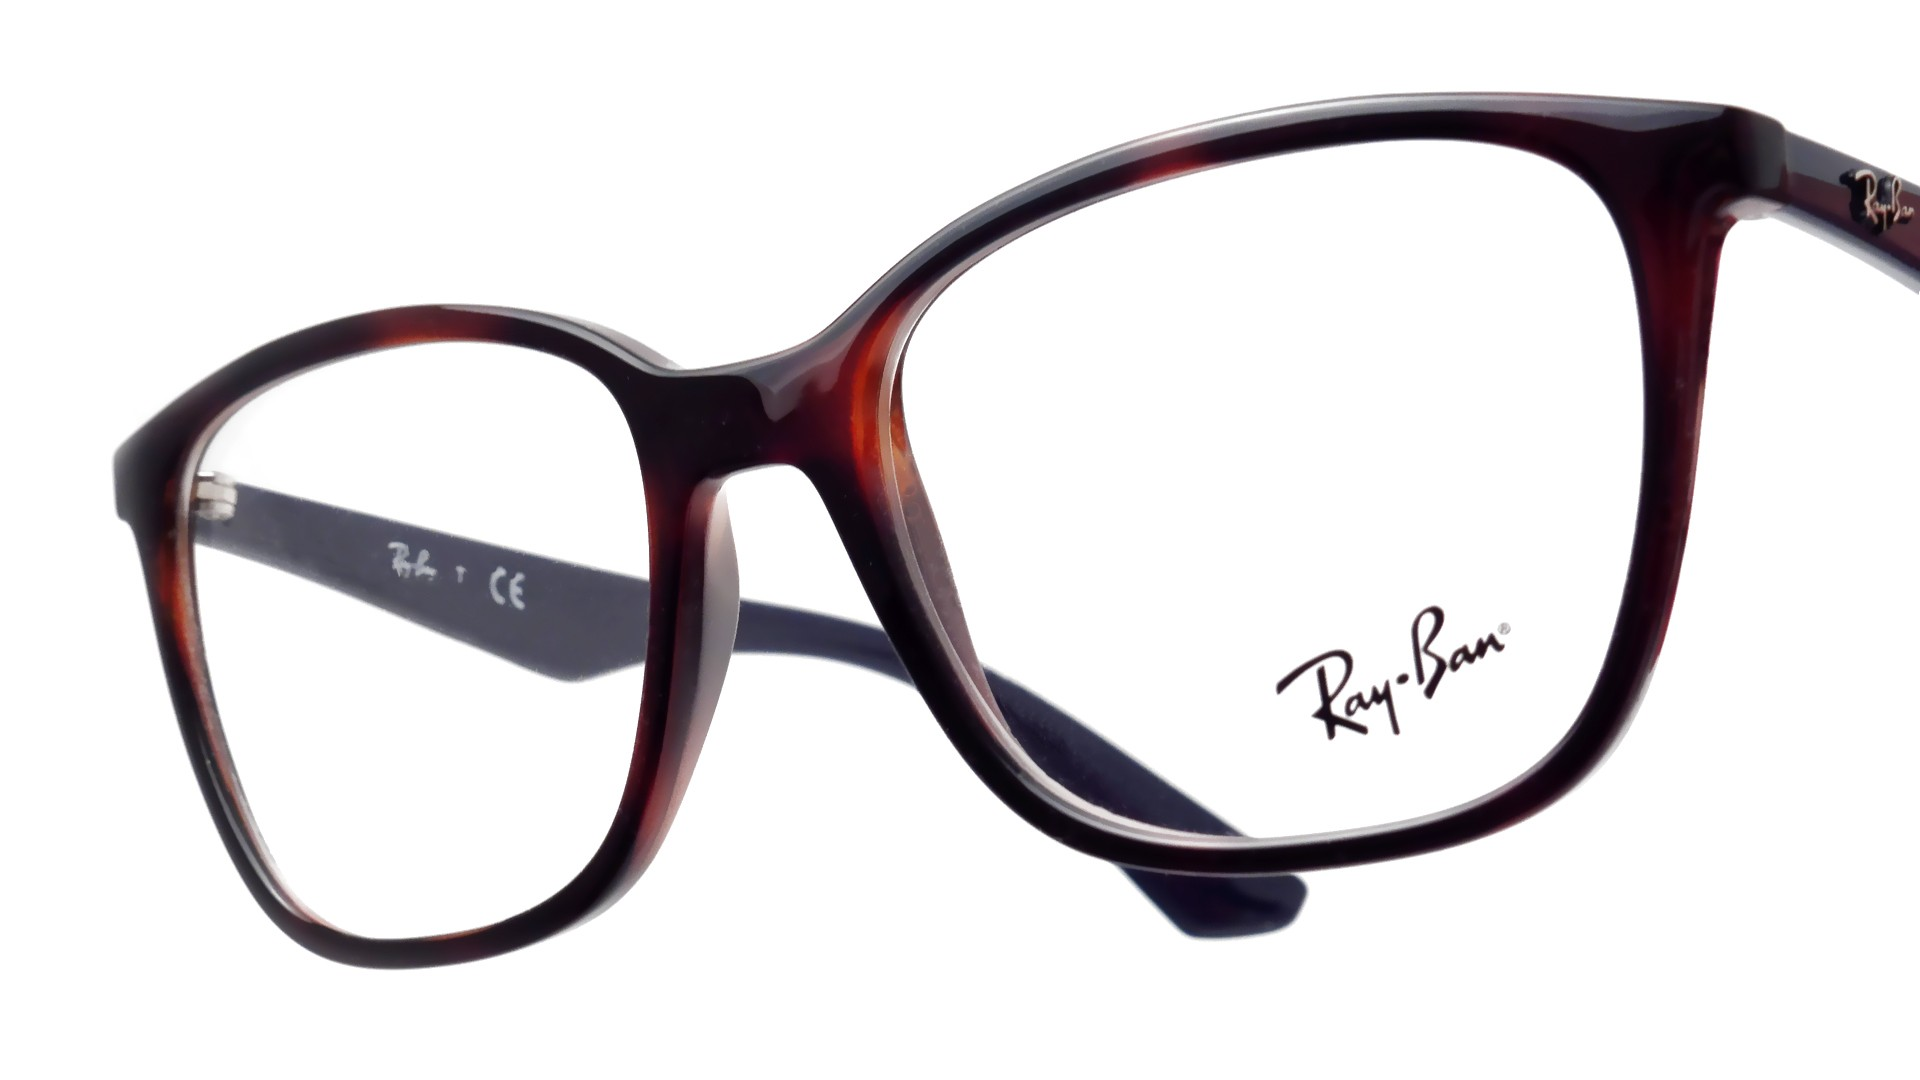 c9010ef590c Eyeglasses Ray Ban RX7066 RB7066 5585 52 17 Tortoise Visiofactory